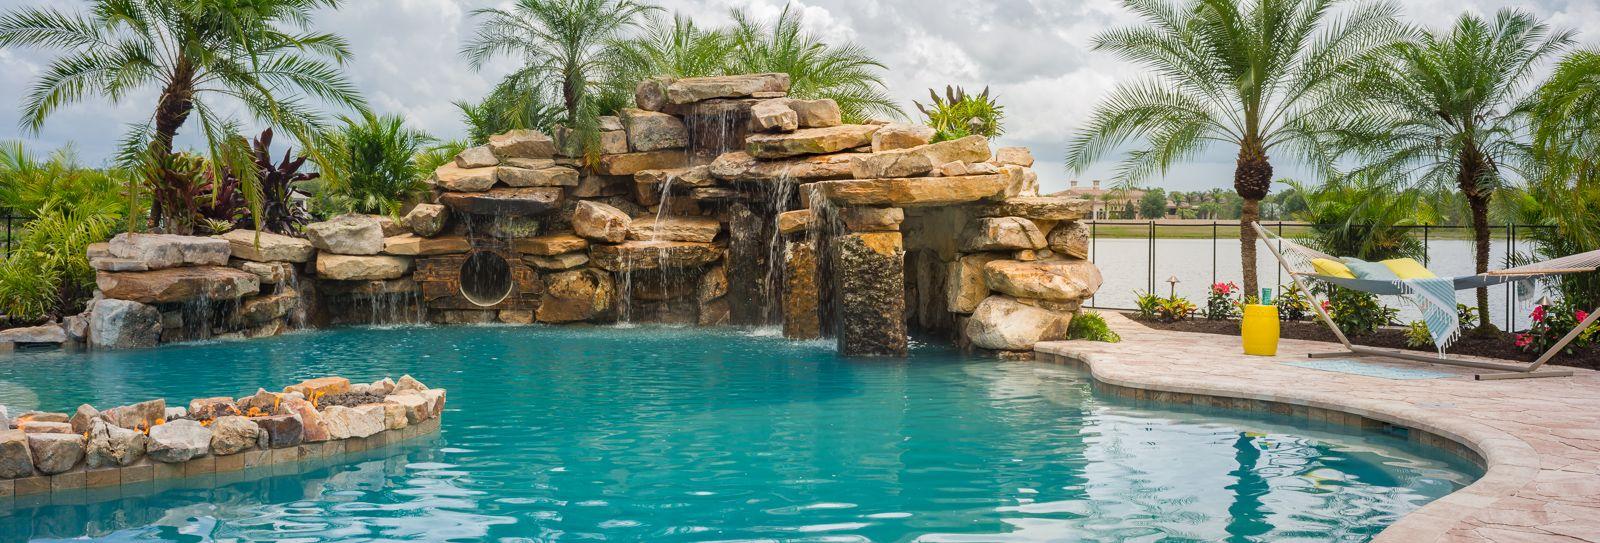 Lucas Lagoons Builds A Massive Luxury Custom Pool At The Concession In Bradenton Florida For Pro Golfer J B Holmes Pool Insane Pools Dream Pools